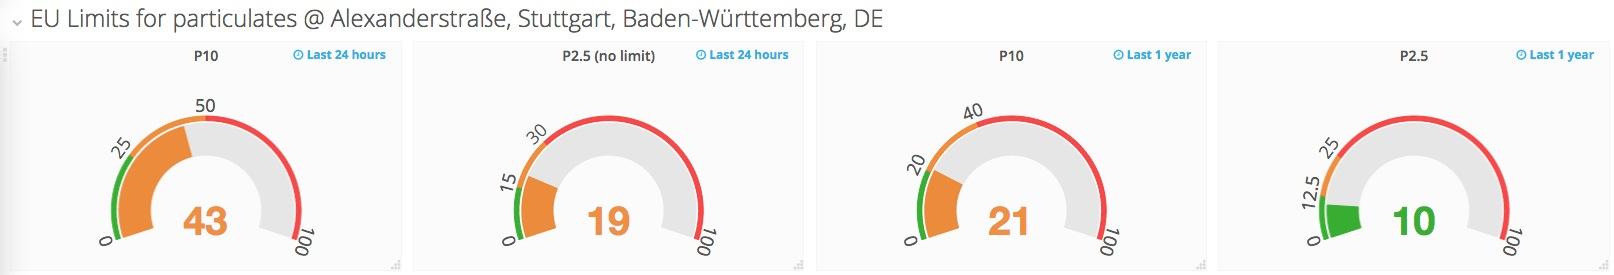 luftdaten.info - Current measurement value, with EU-Limits (orange)